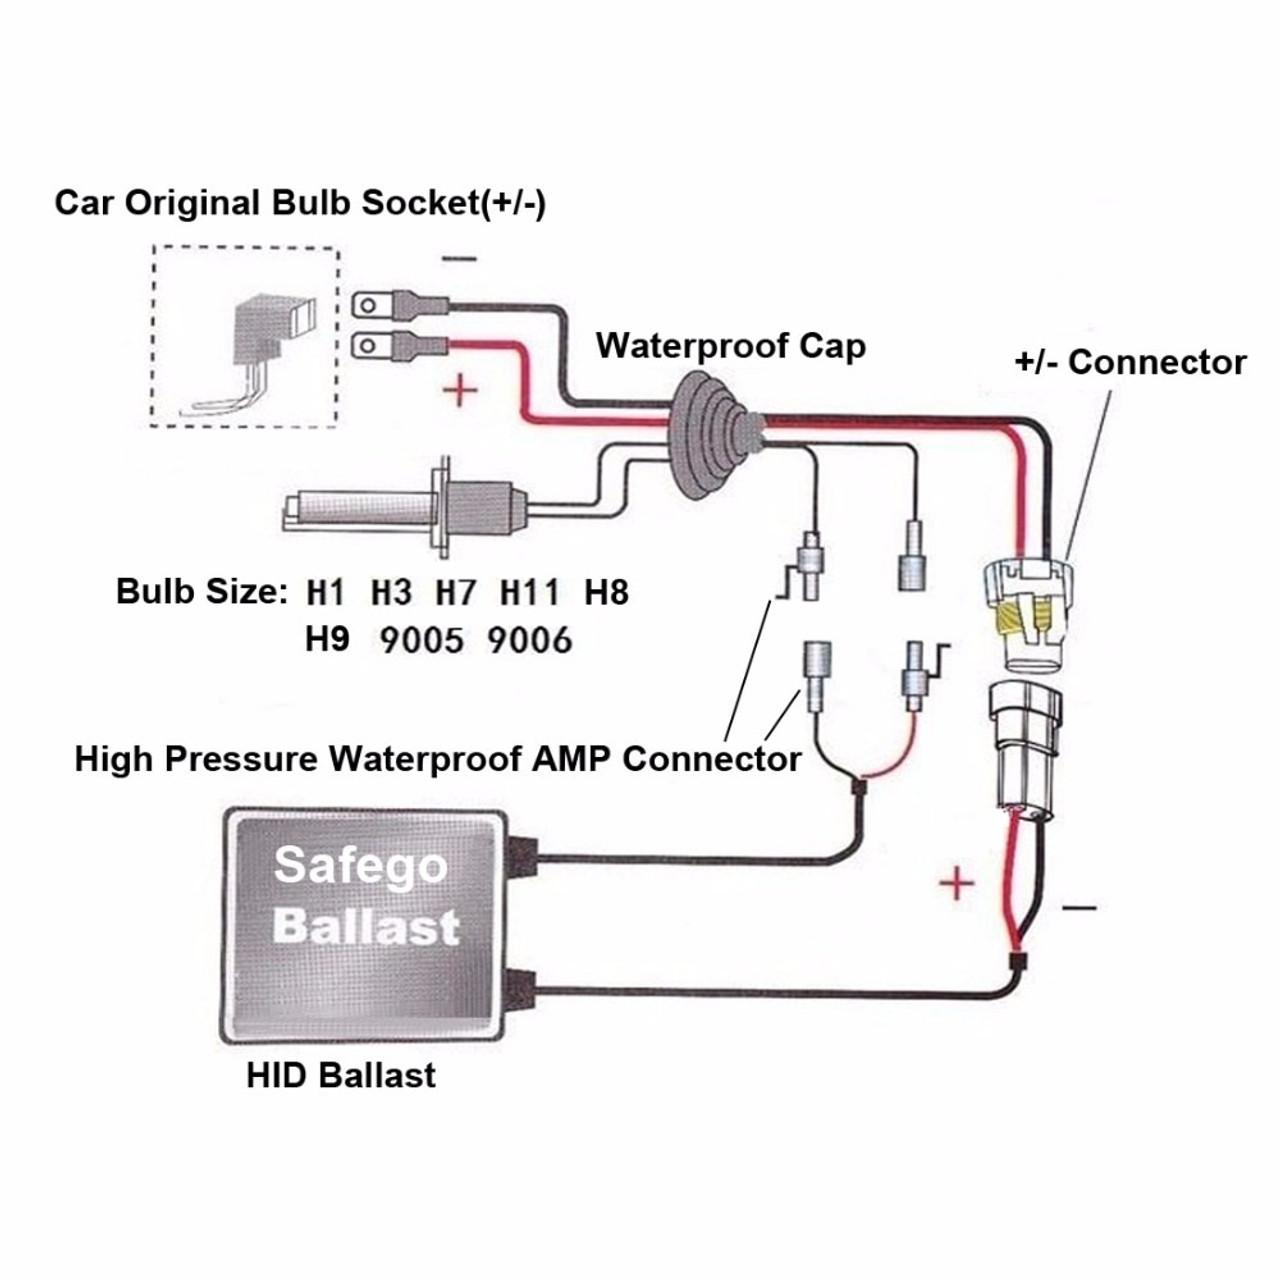 slim ballast hid kit xenon 35w h4 h7 h11 xenon hid conversion kit h1 corolla diy diy non hid 9005 9006 to h4 conversion diagram [ 1280 x 1280 Pixel ]